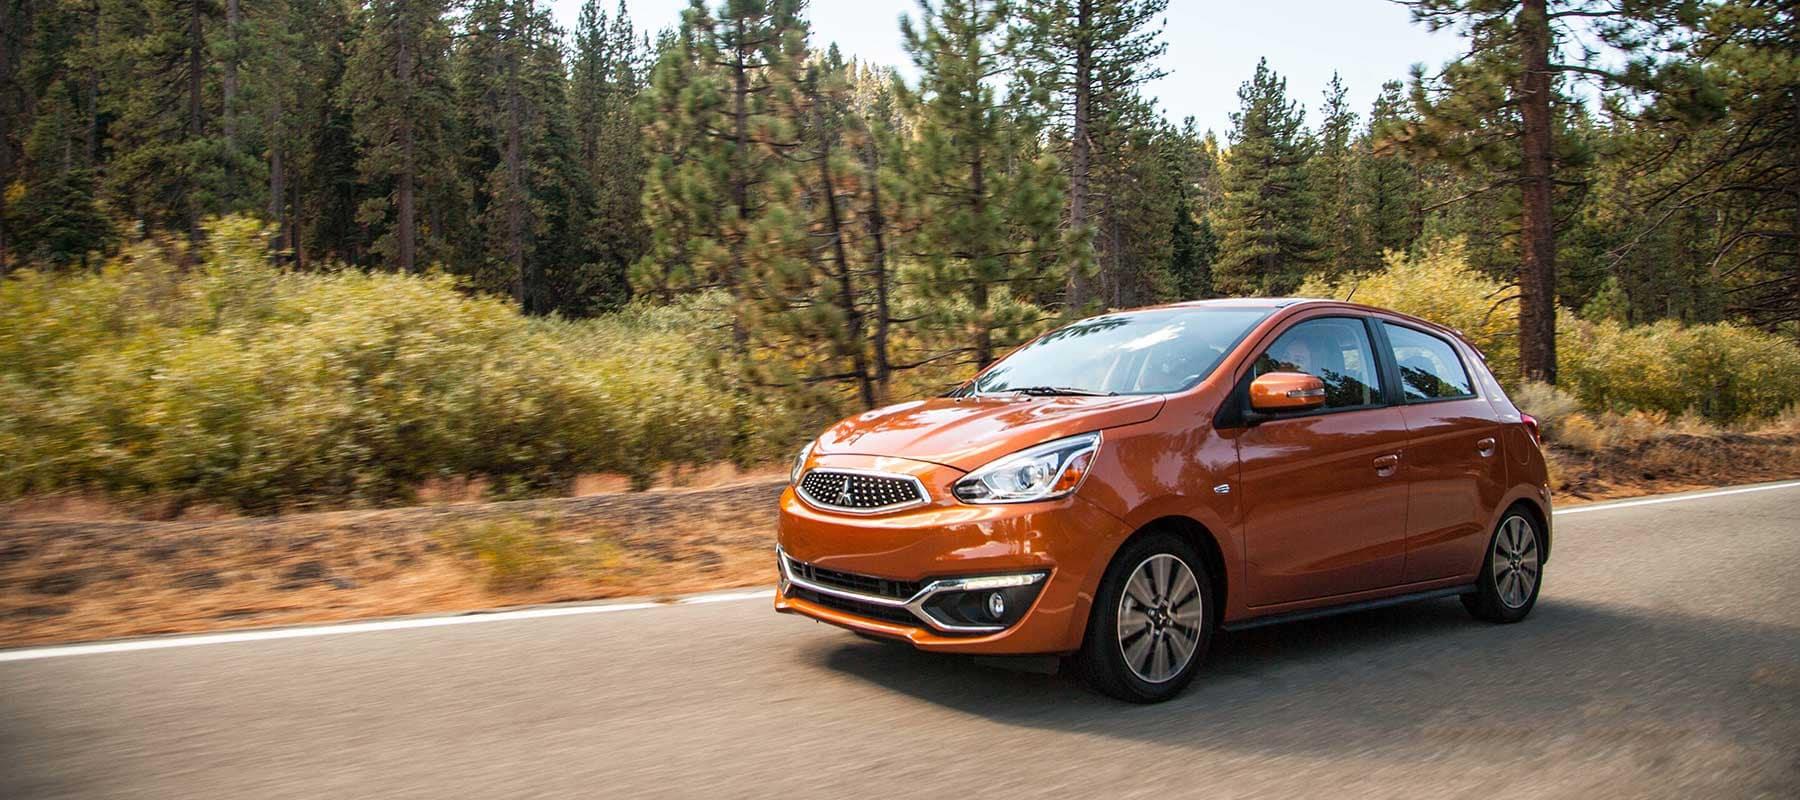 2019-Orange-Mitsubishi-Mirage driving through a forest road